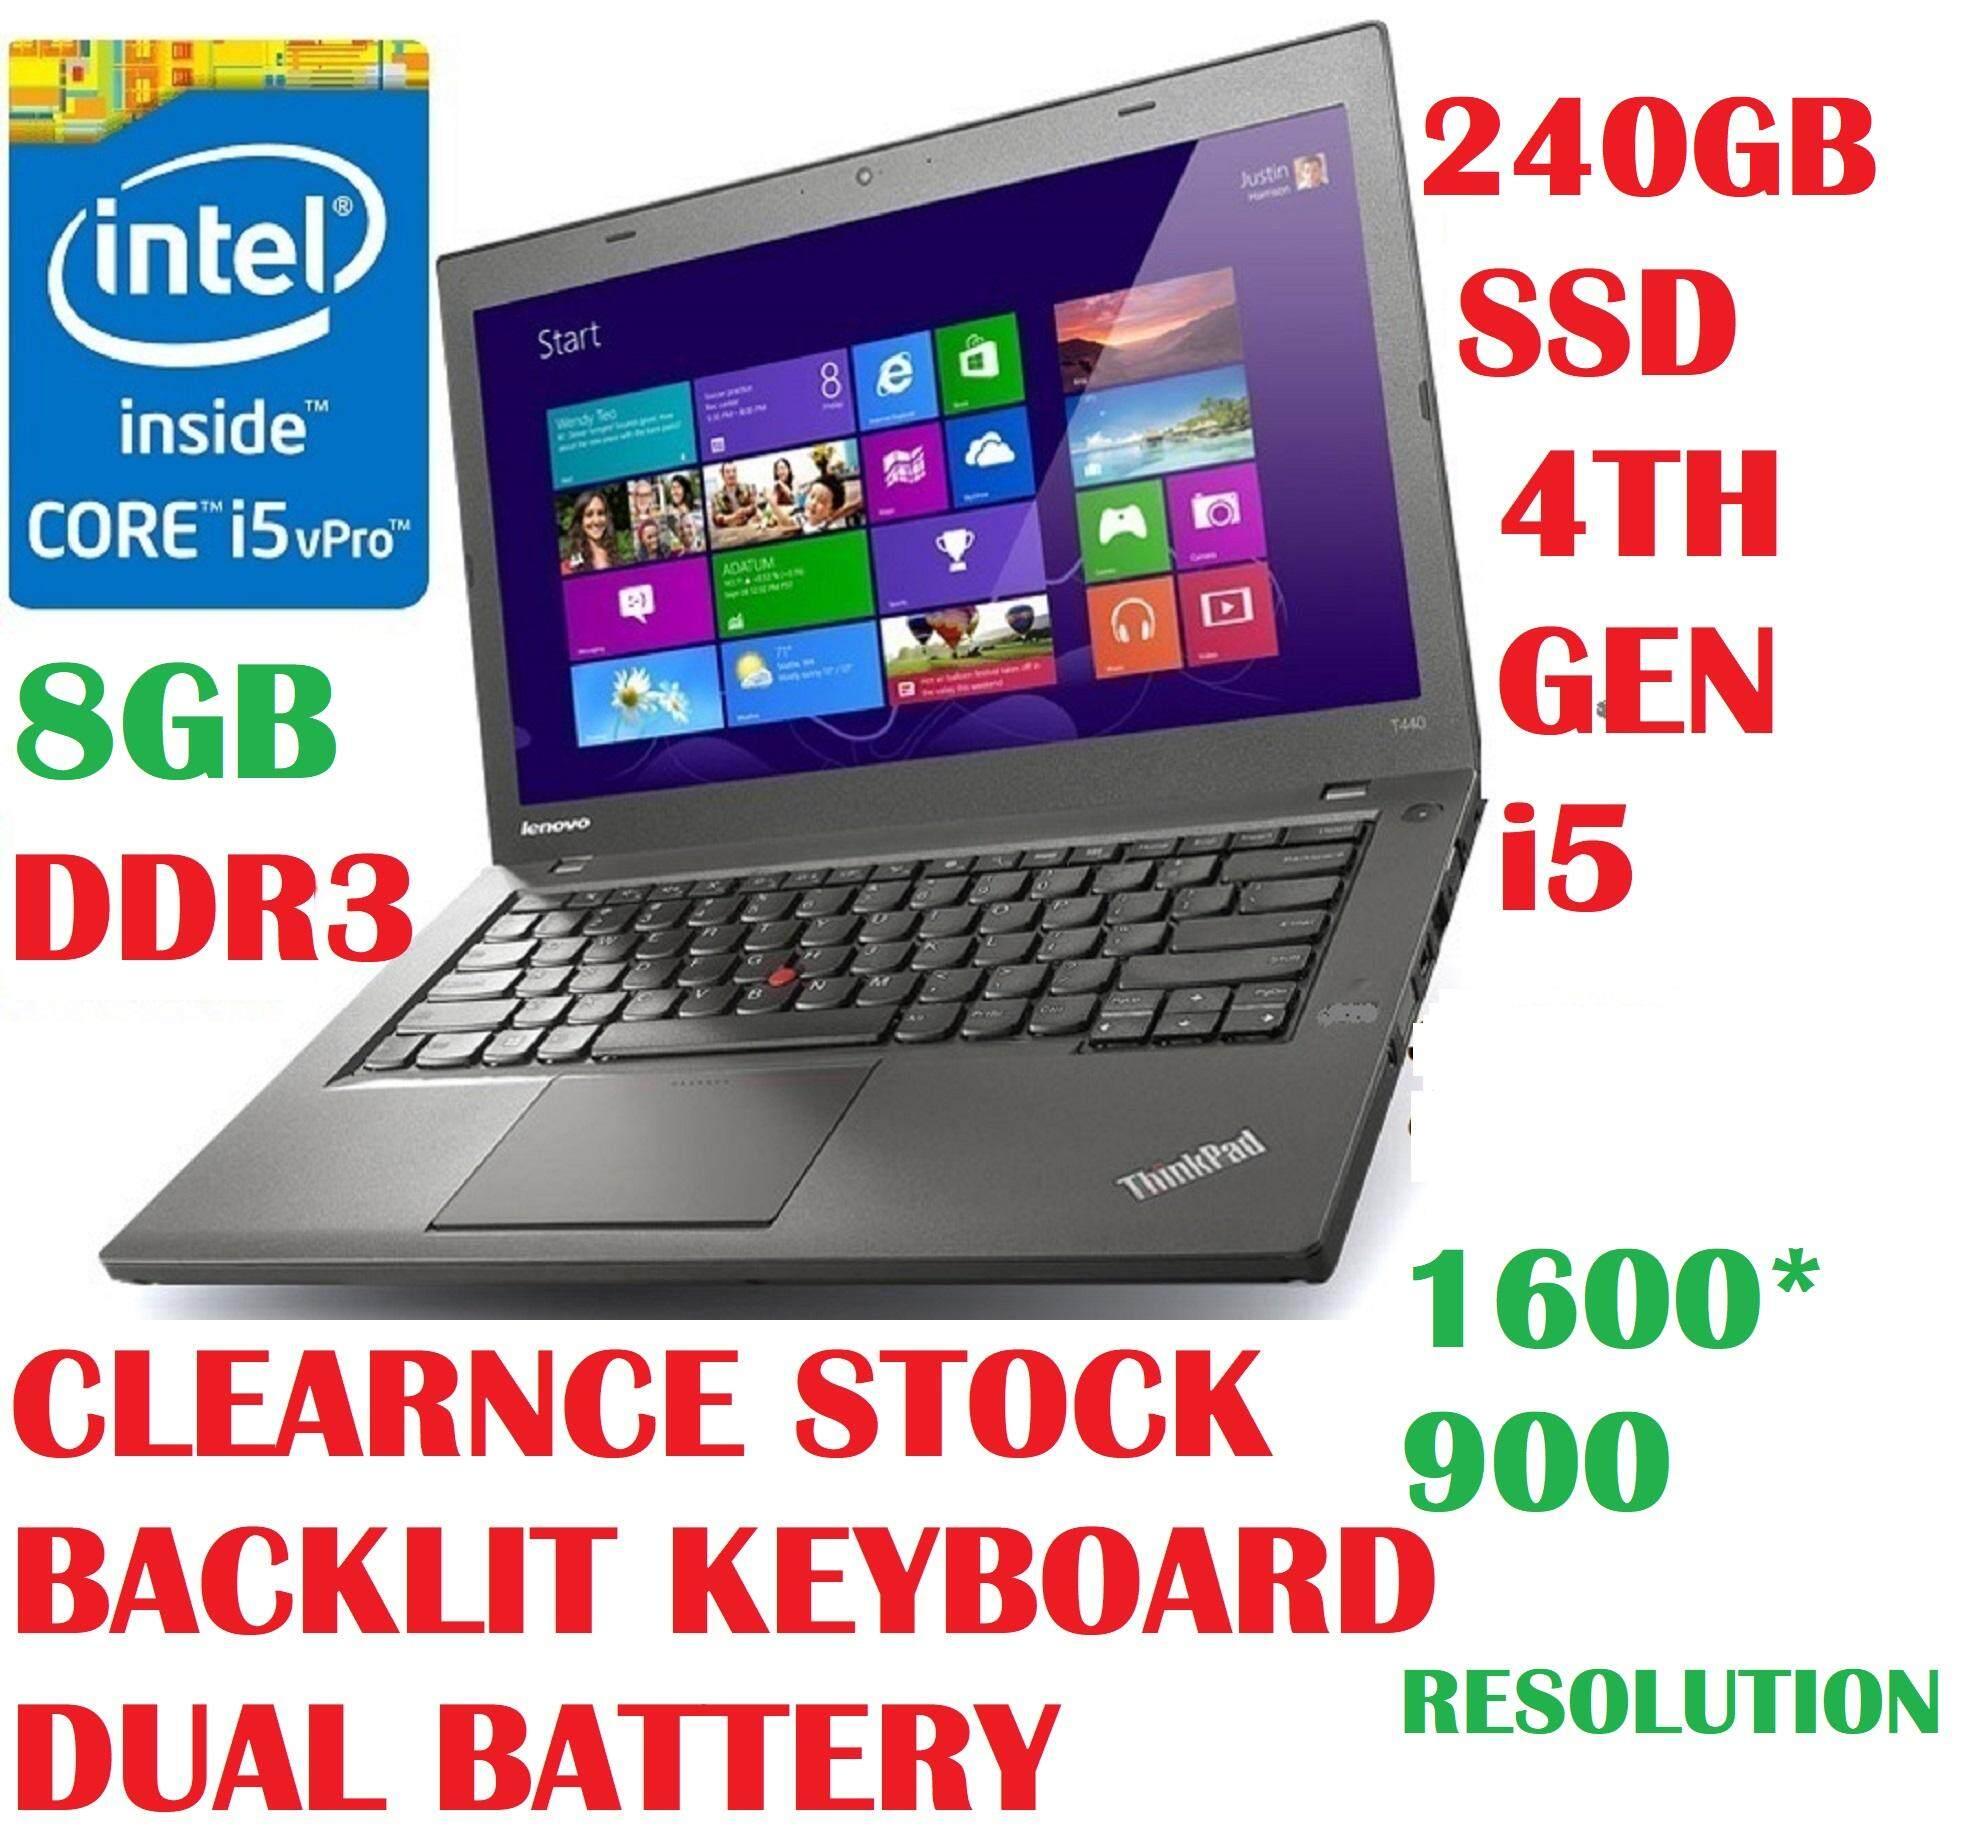 (REFURBISHED)LENOVO T440 (SLIM) INTEL CORE i5-4300U PROCESSOR 1 9TO 2 5 GHZ  V PRO CPU/8GB DDR3 RAM/240GB SSD/14 0